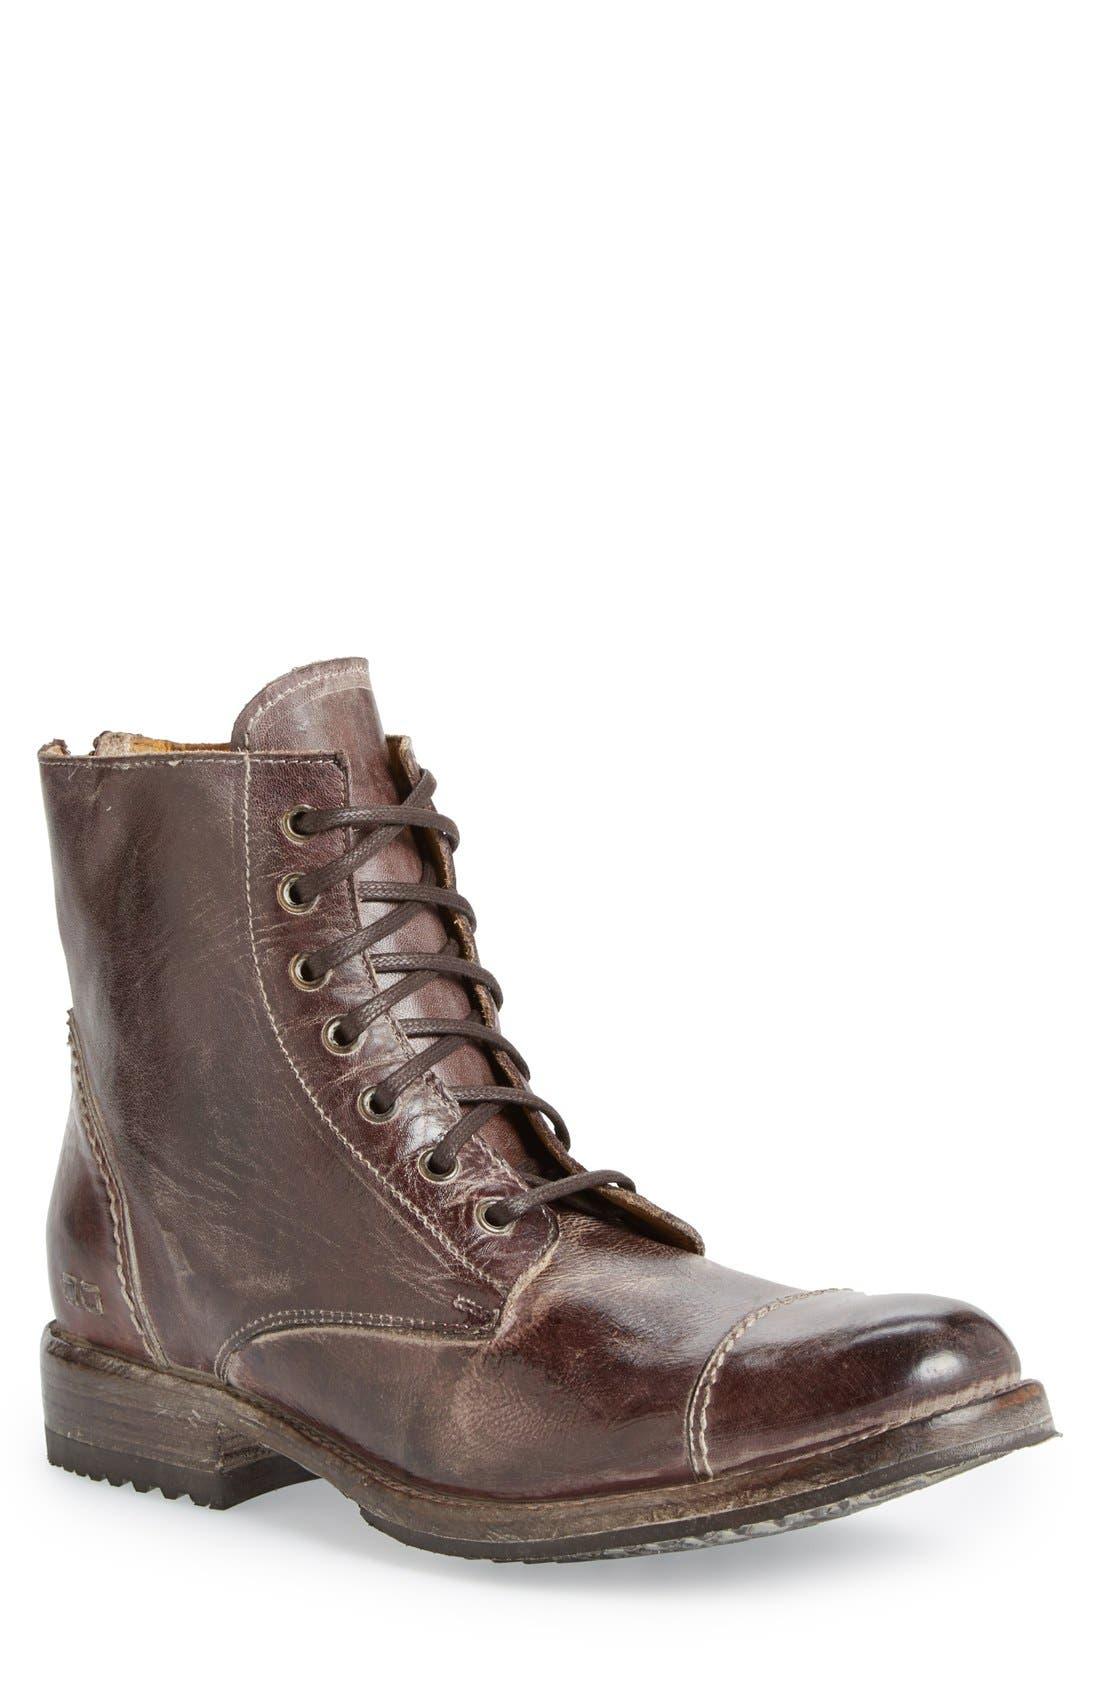 Main Image - Bed Stu 'Protégé' Cap Toe Boot (Men)